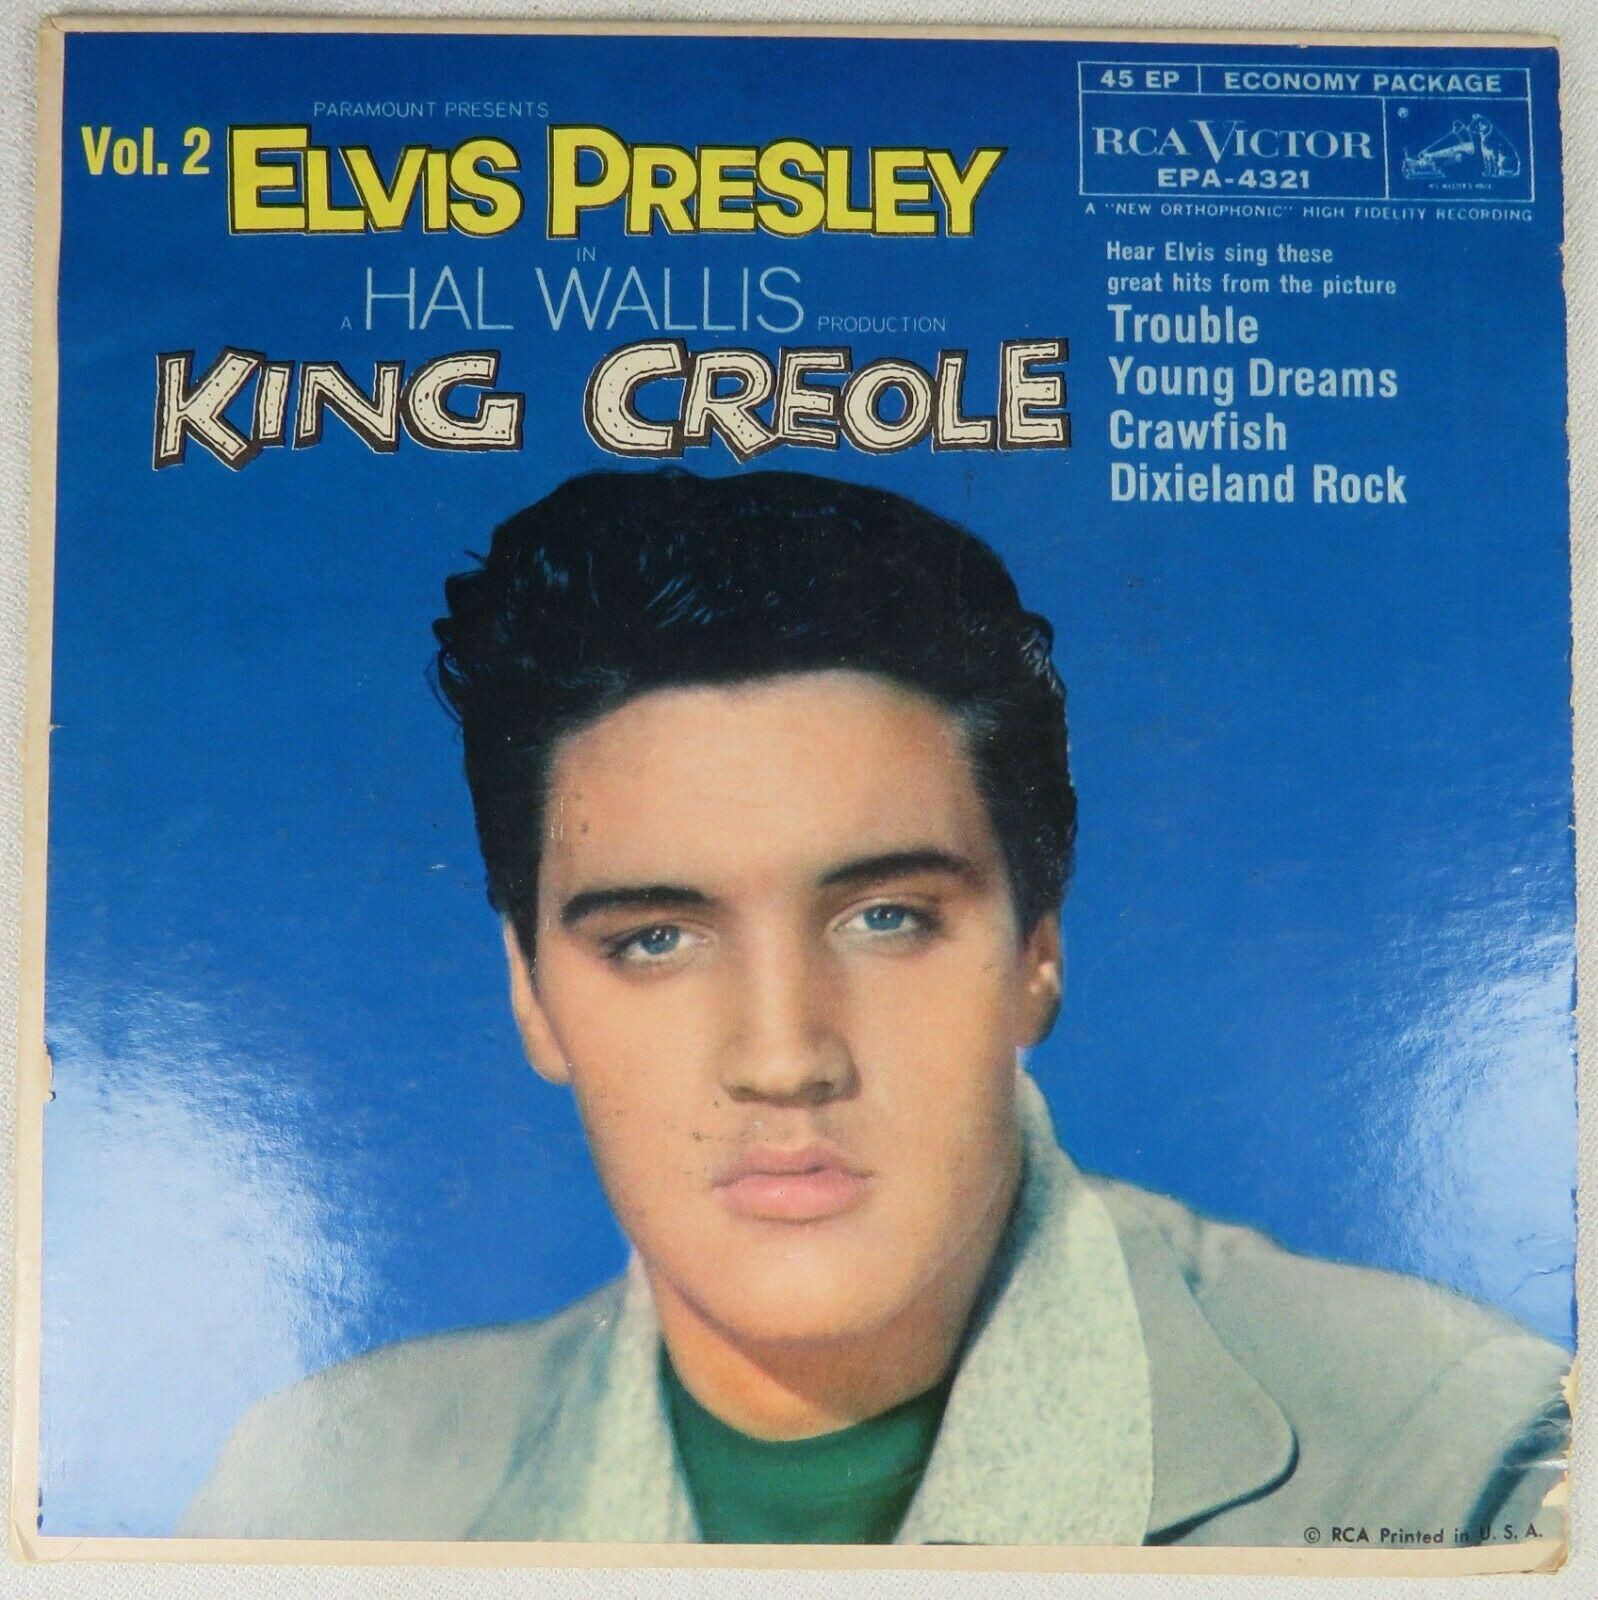 "Elvis Presley - King Creole Vol 2 - 1958 45rpm 7"" EP Pic Sleeve EPA-4321 VG++"